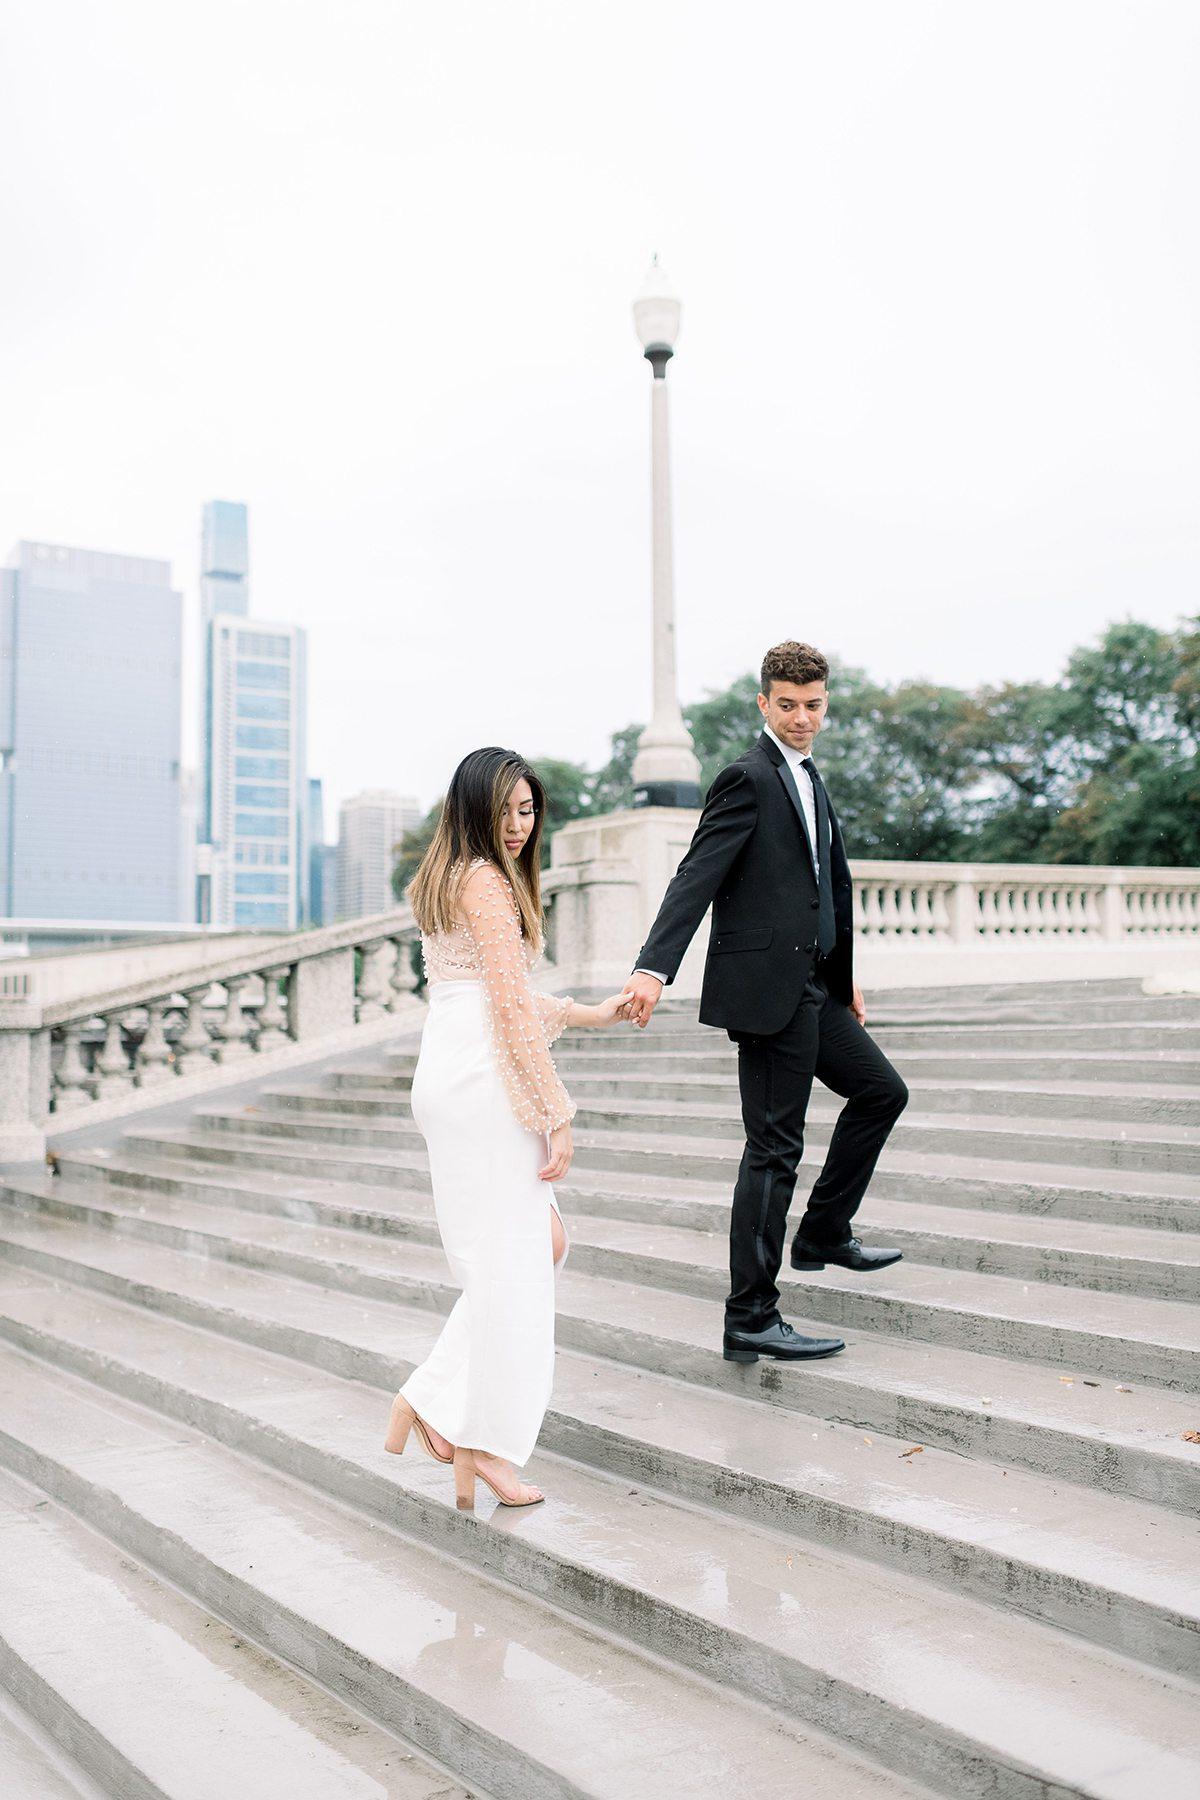 Chicago, IL Engagement Photographers - Larissa Marie Photography